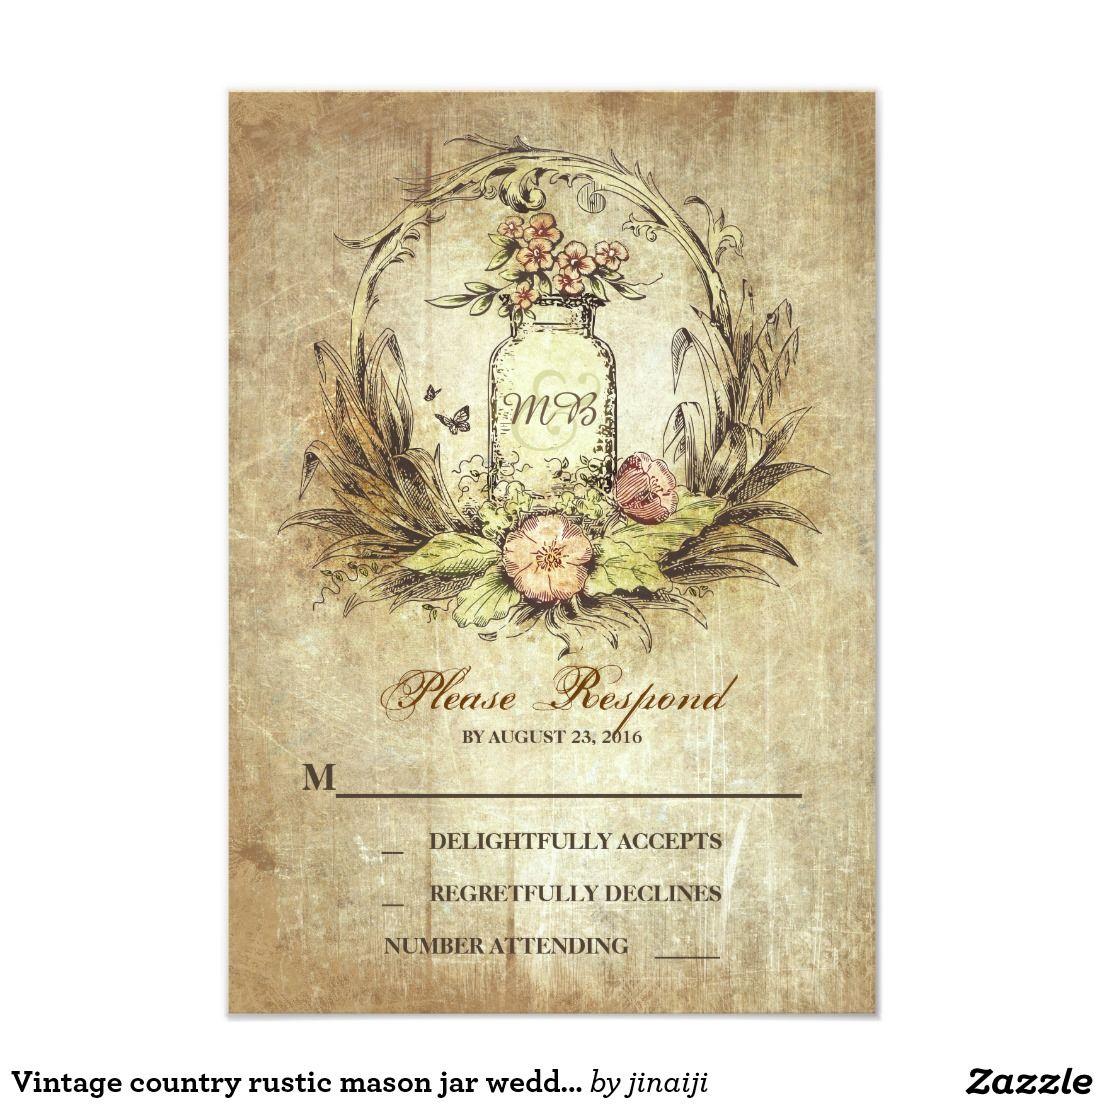 Vintage country rustic mason jar wedding RSVP Card